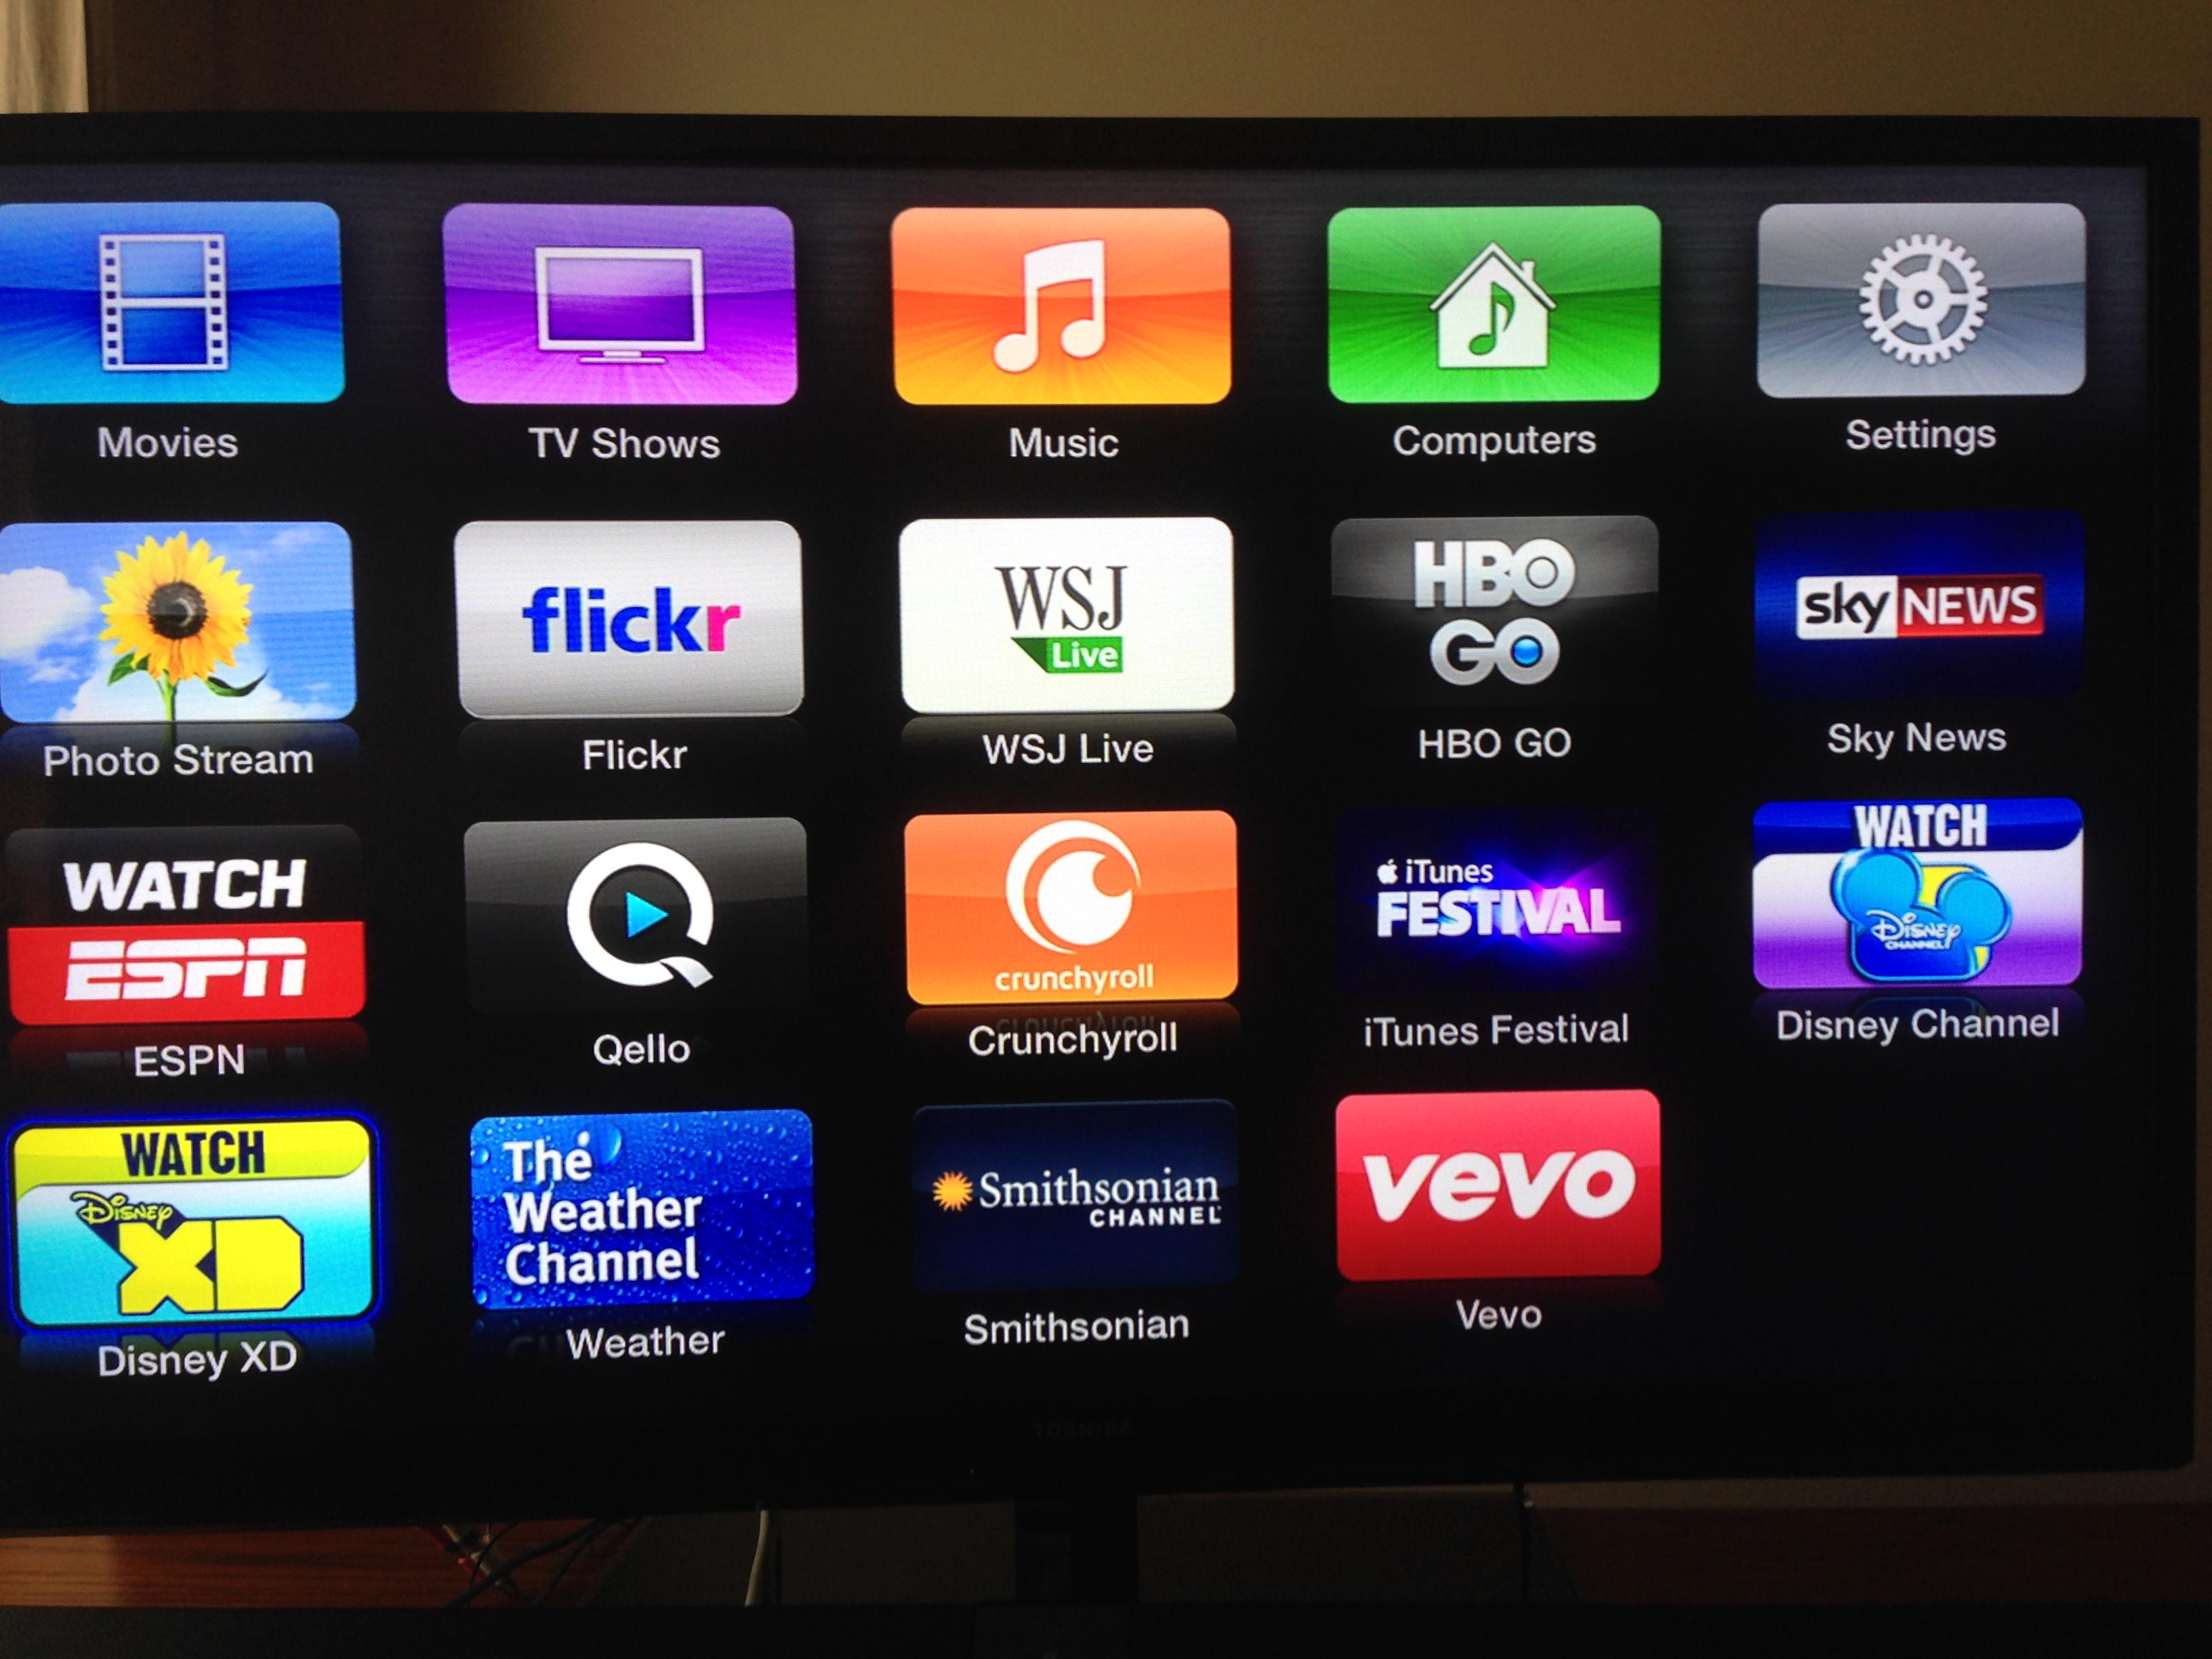 Apple TV Gains Vevo, Disney Channel HD, Disney XD, Weather